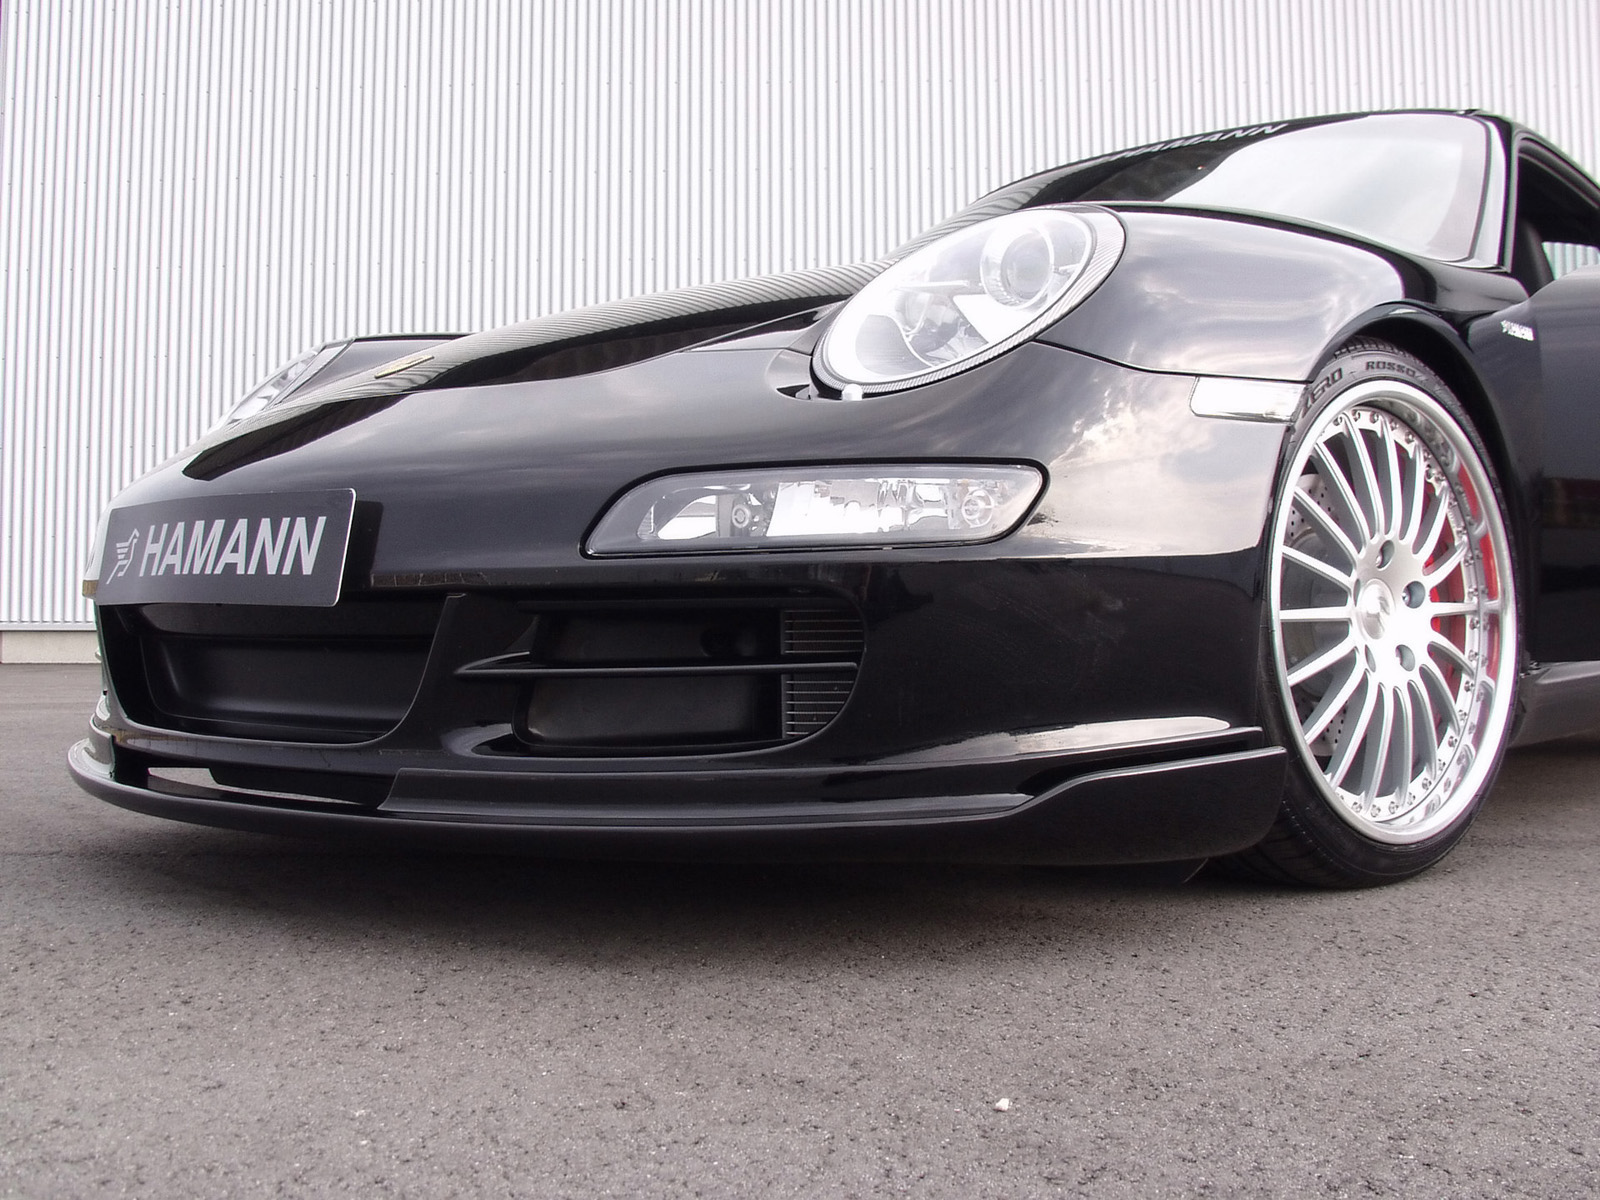 2006 Porsche 911 Image